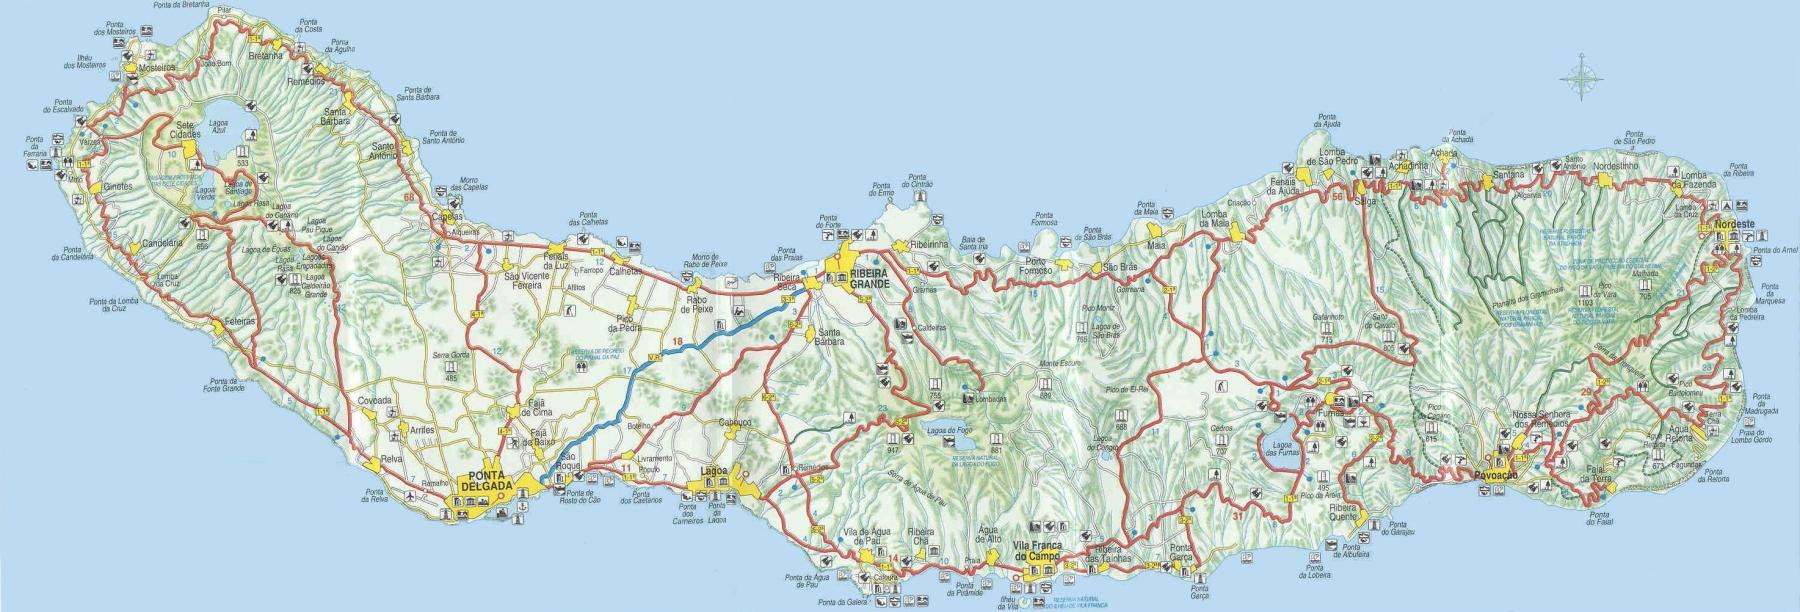 mapa sao miguel SwissEduc   Stromboli online   Azores mapa sao miguel